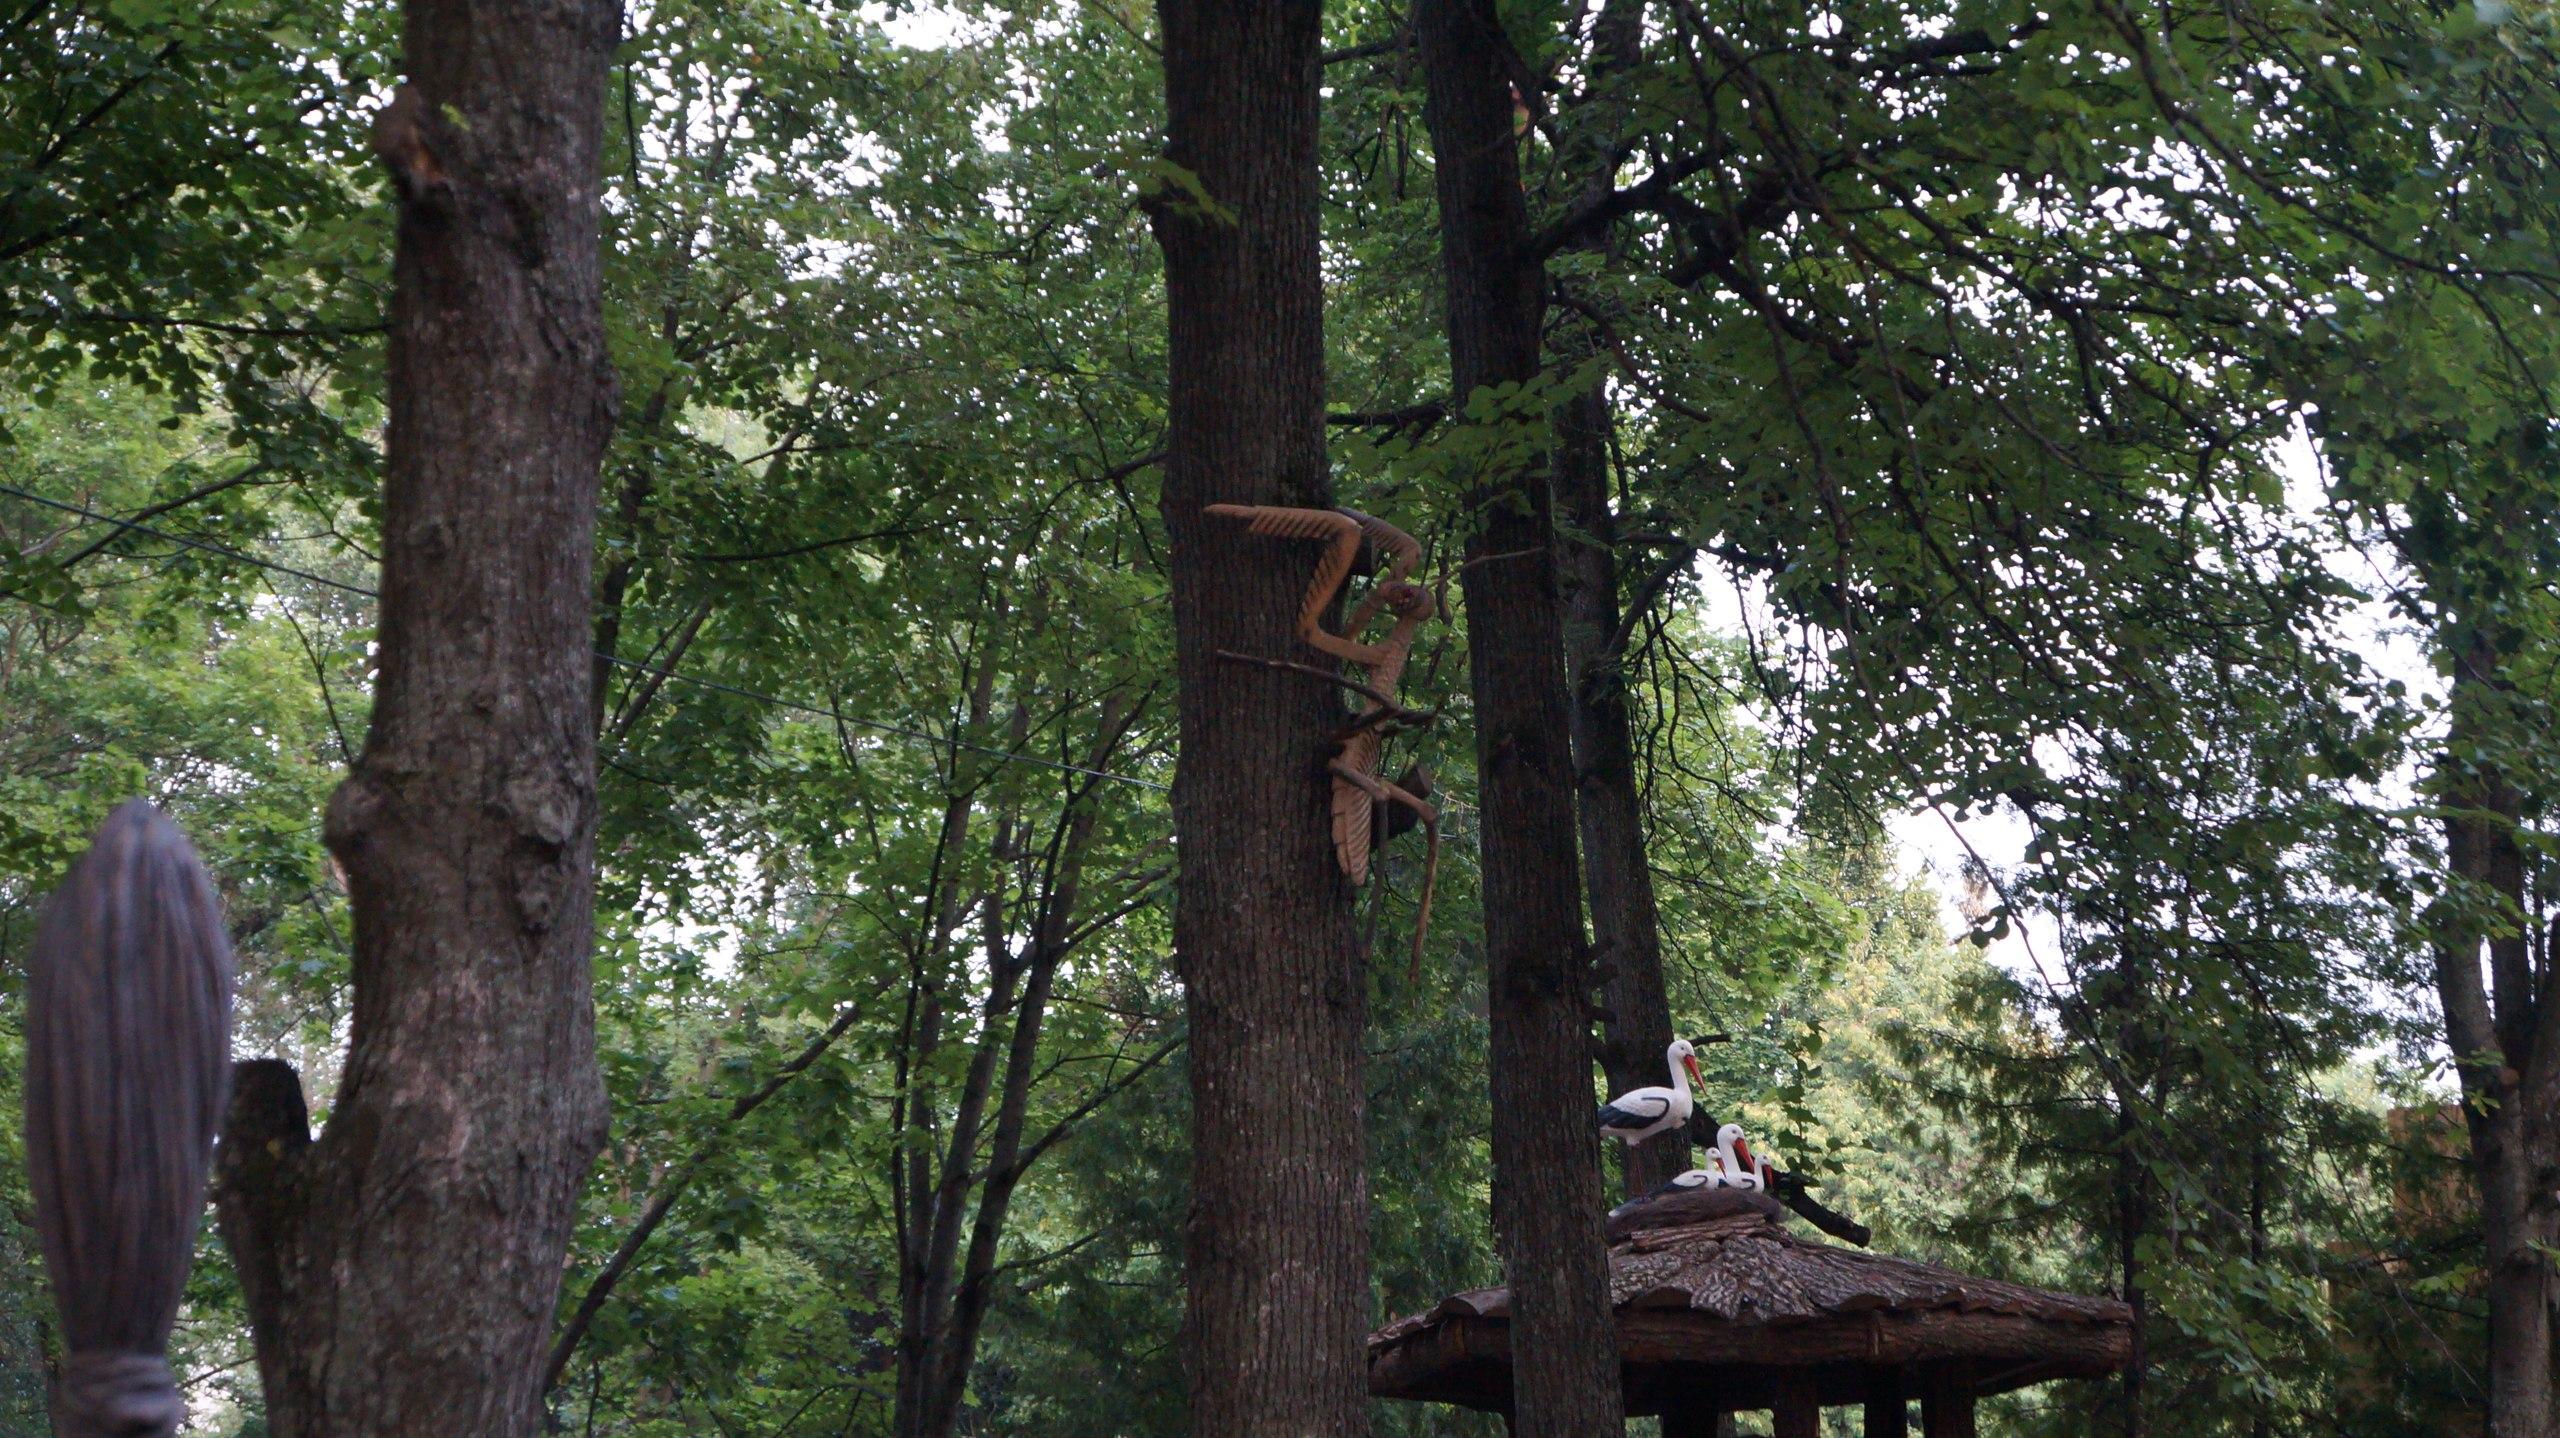 Завез бабу в лес фото 65-830